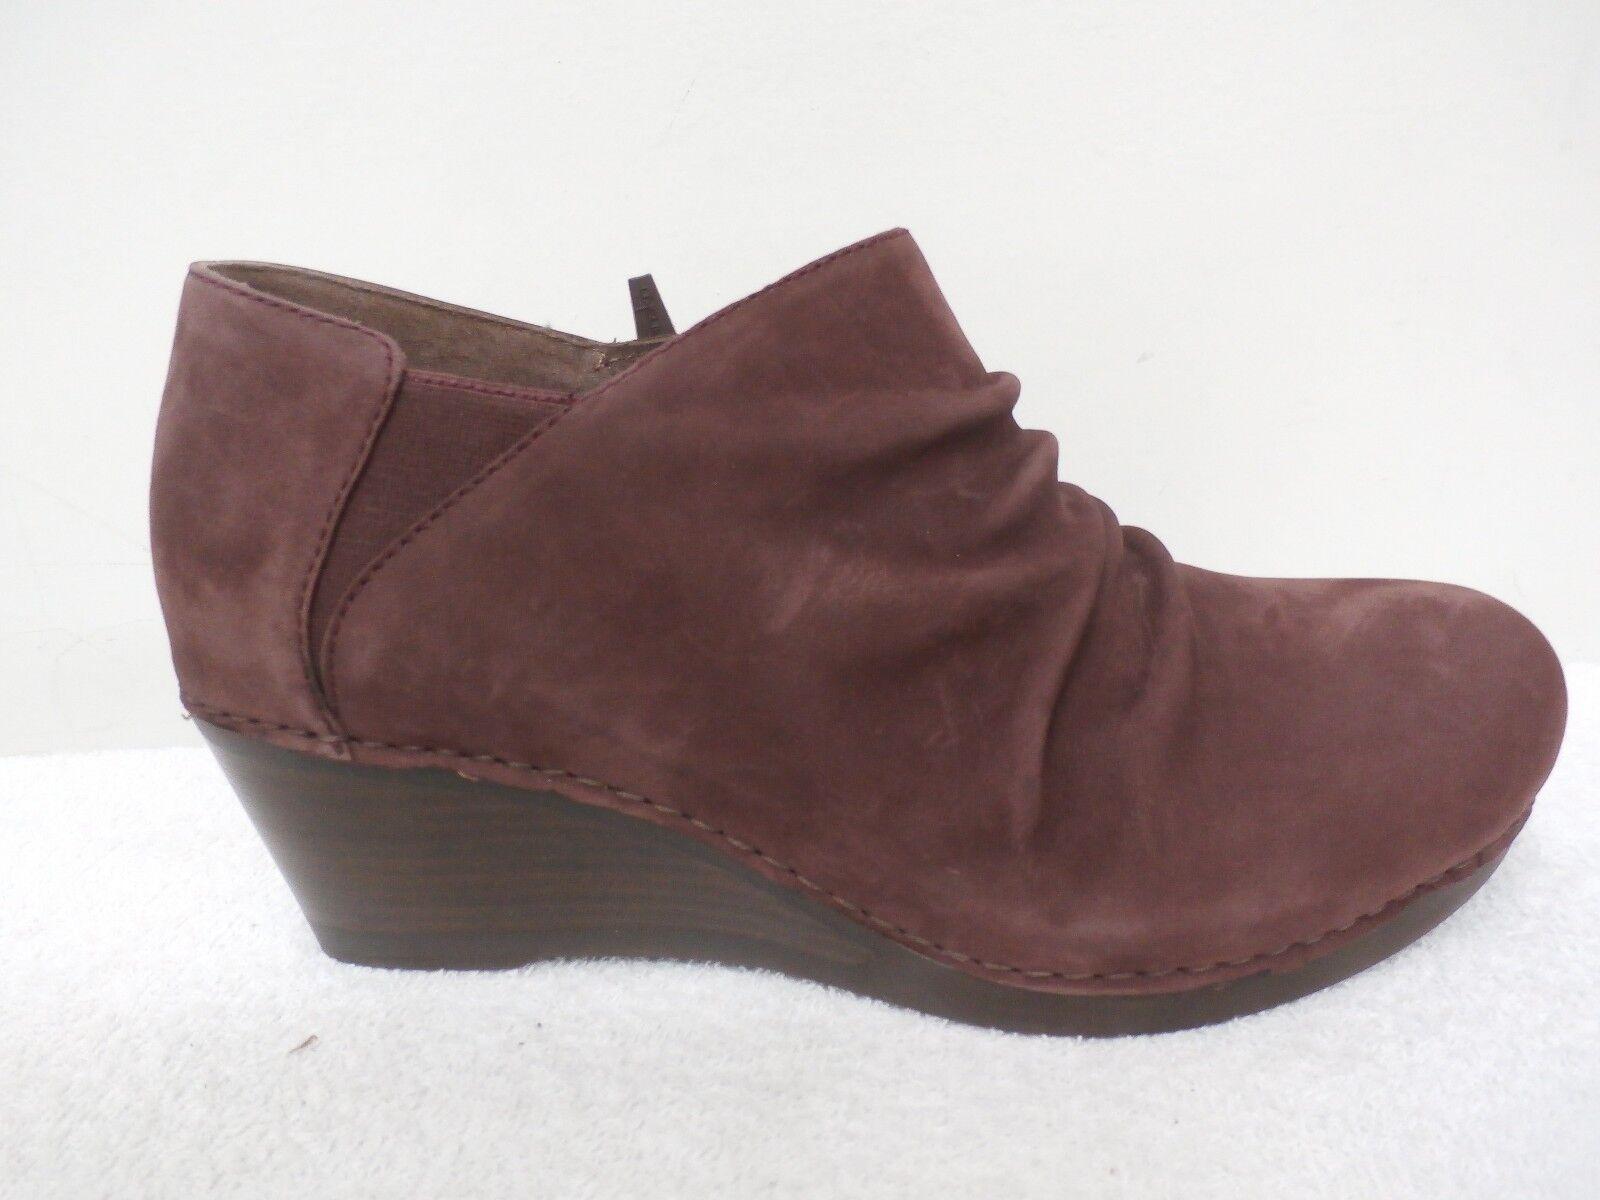 Dansko Leather Ruched Wedge Boots - Sheena RAISIN NUBUCK (BURGUNDY) 36=5.5-6